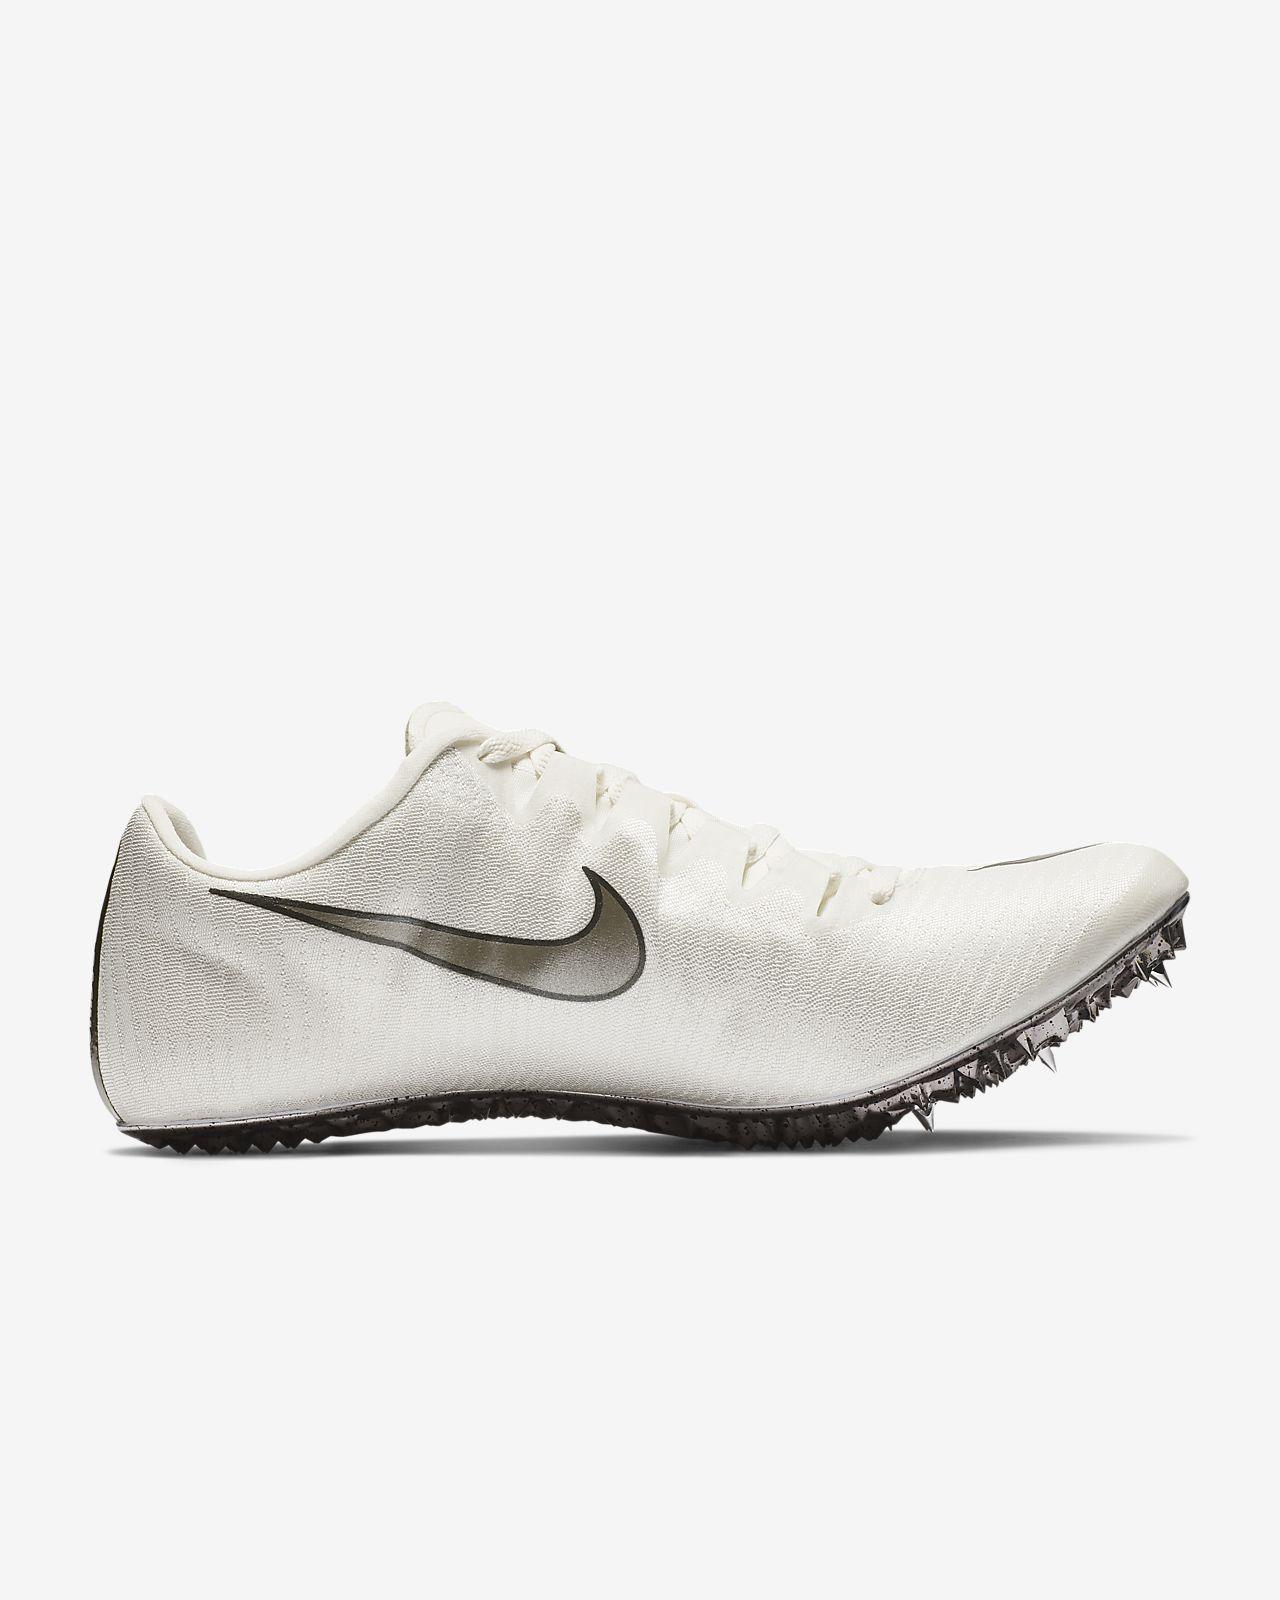 nike store scarpe chiodate